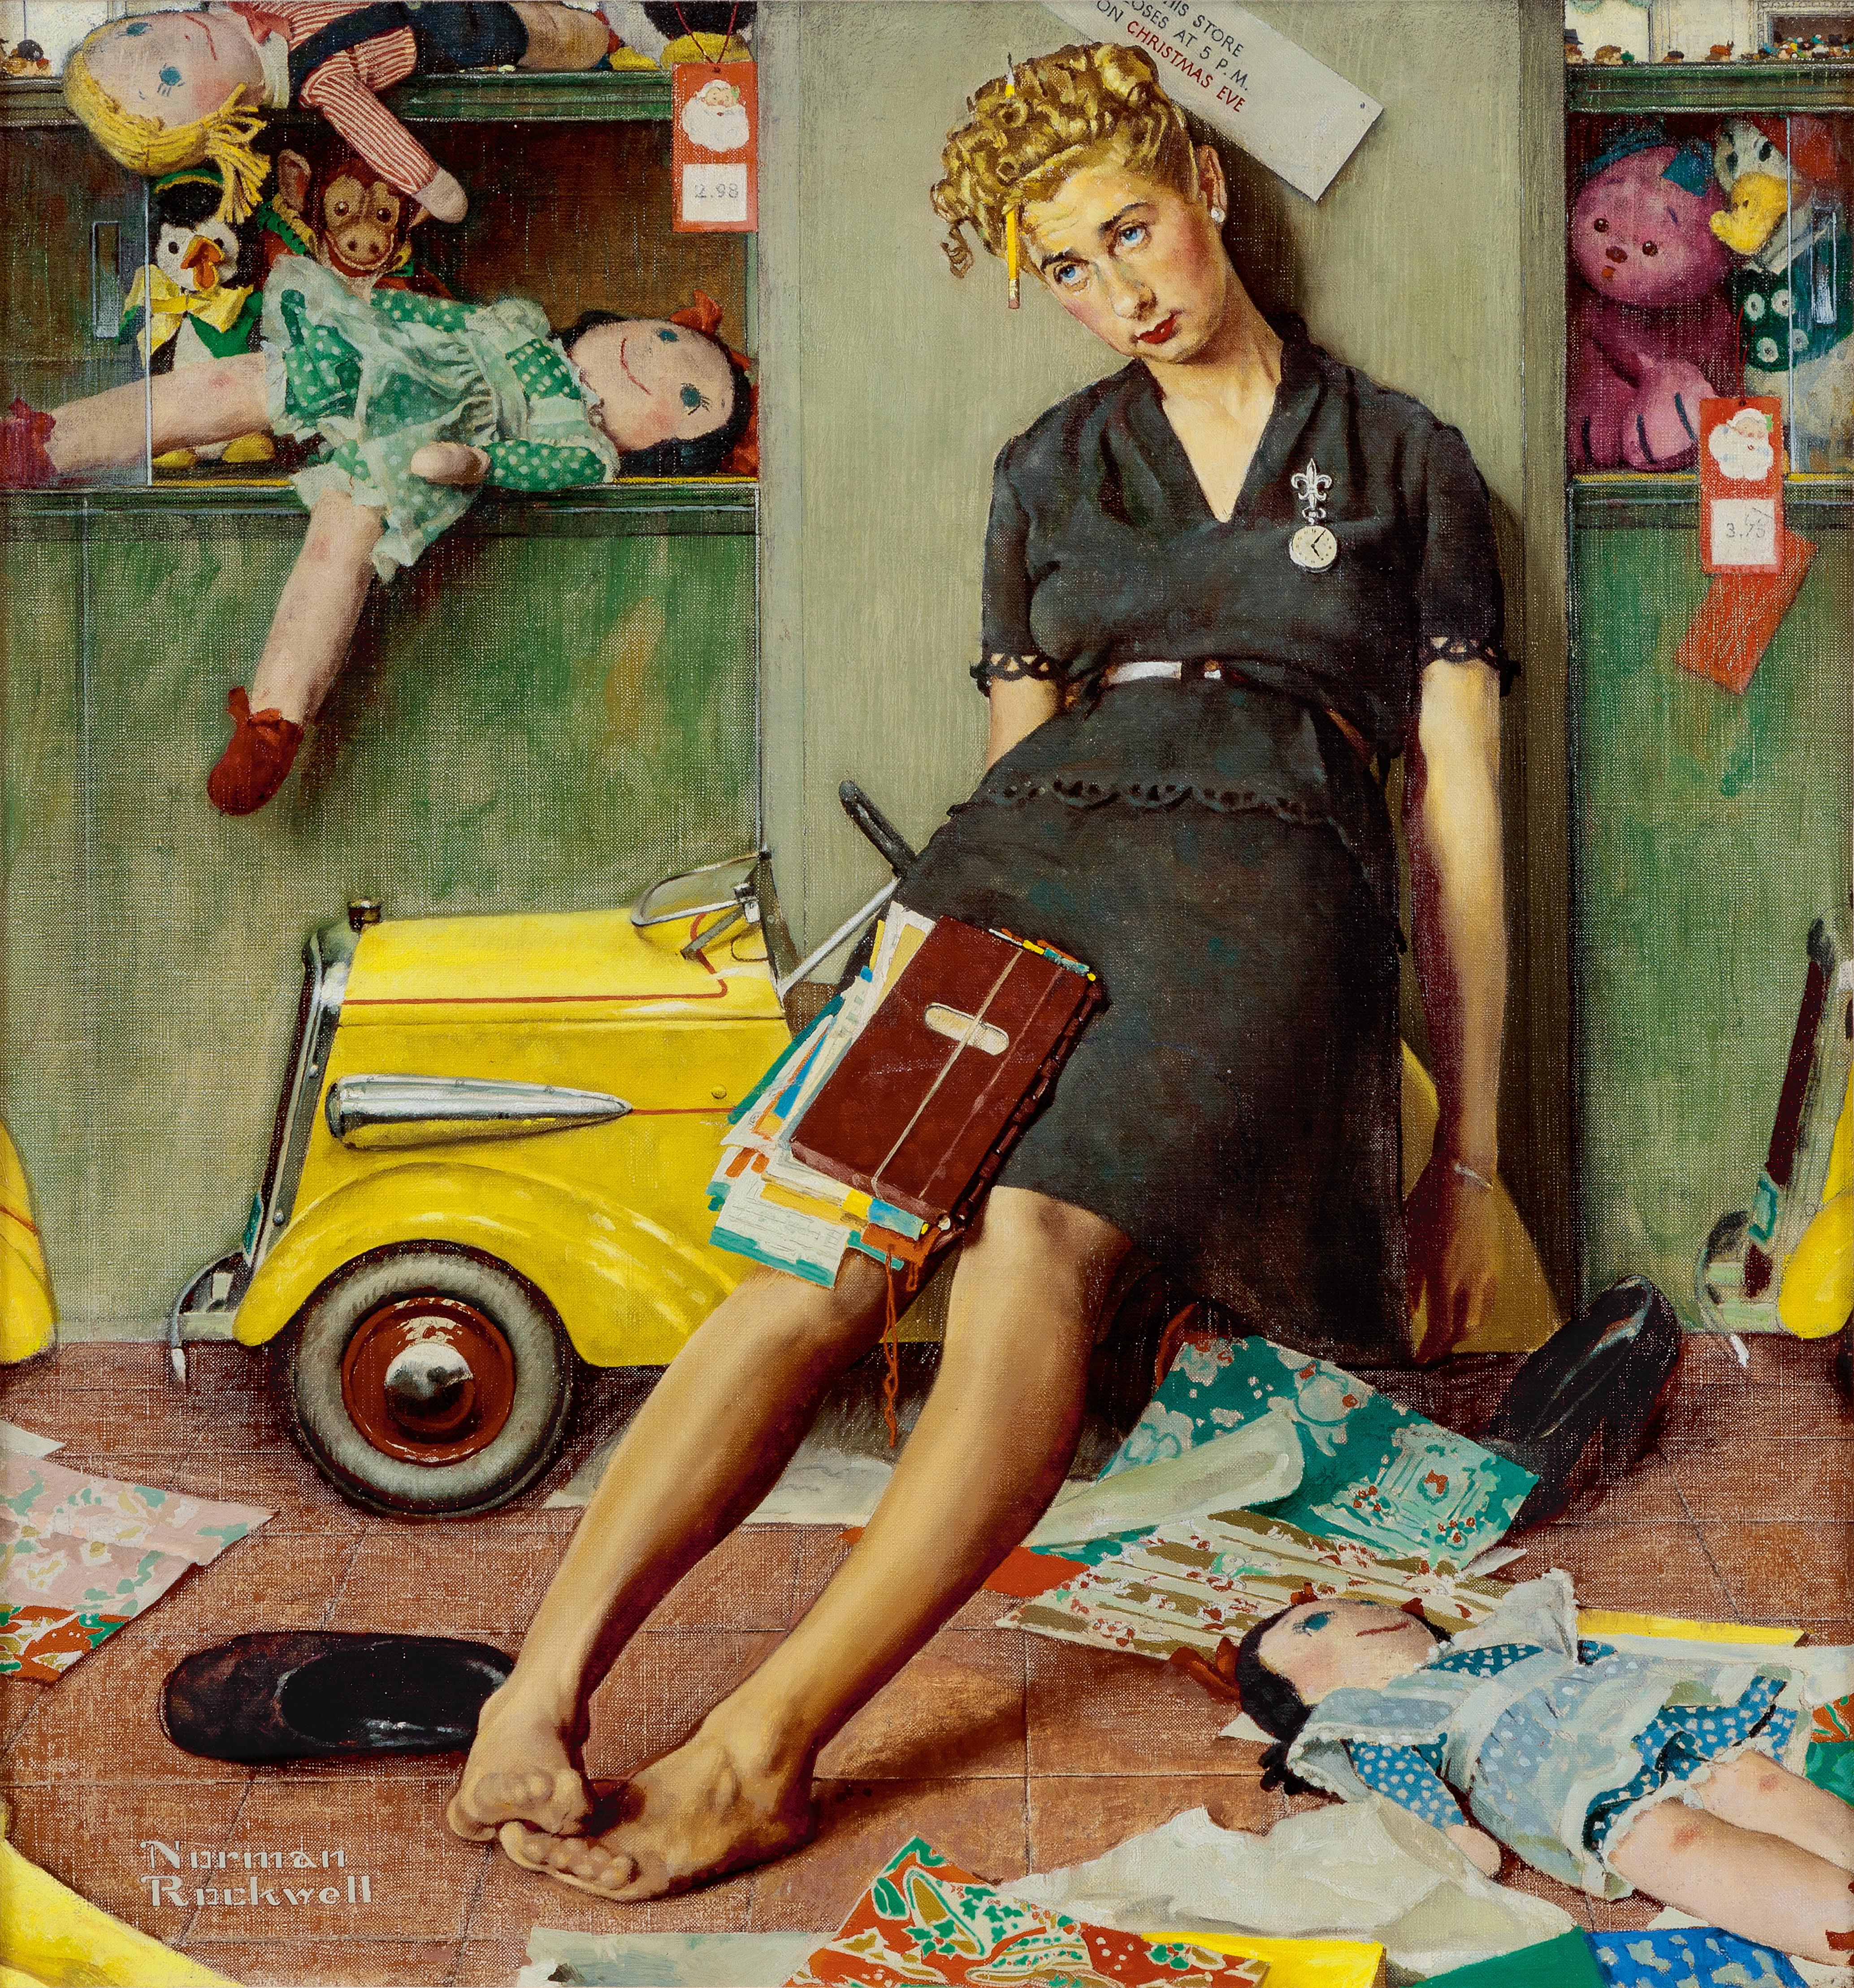 Norman Rockwell & the Modern American Christmas | American Art ...